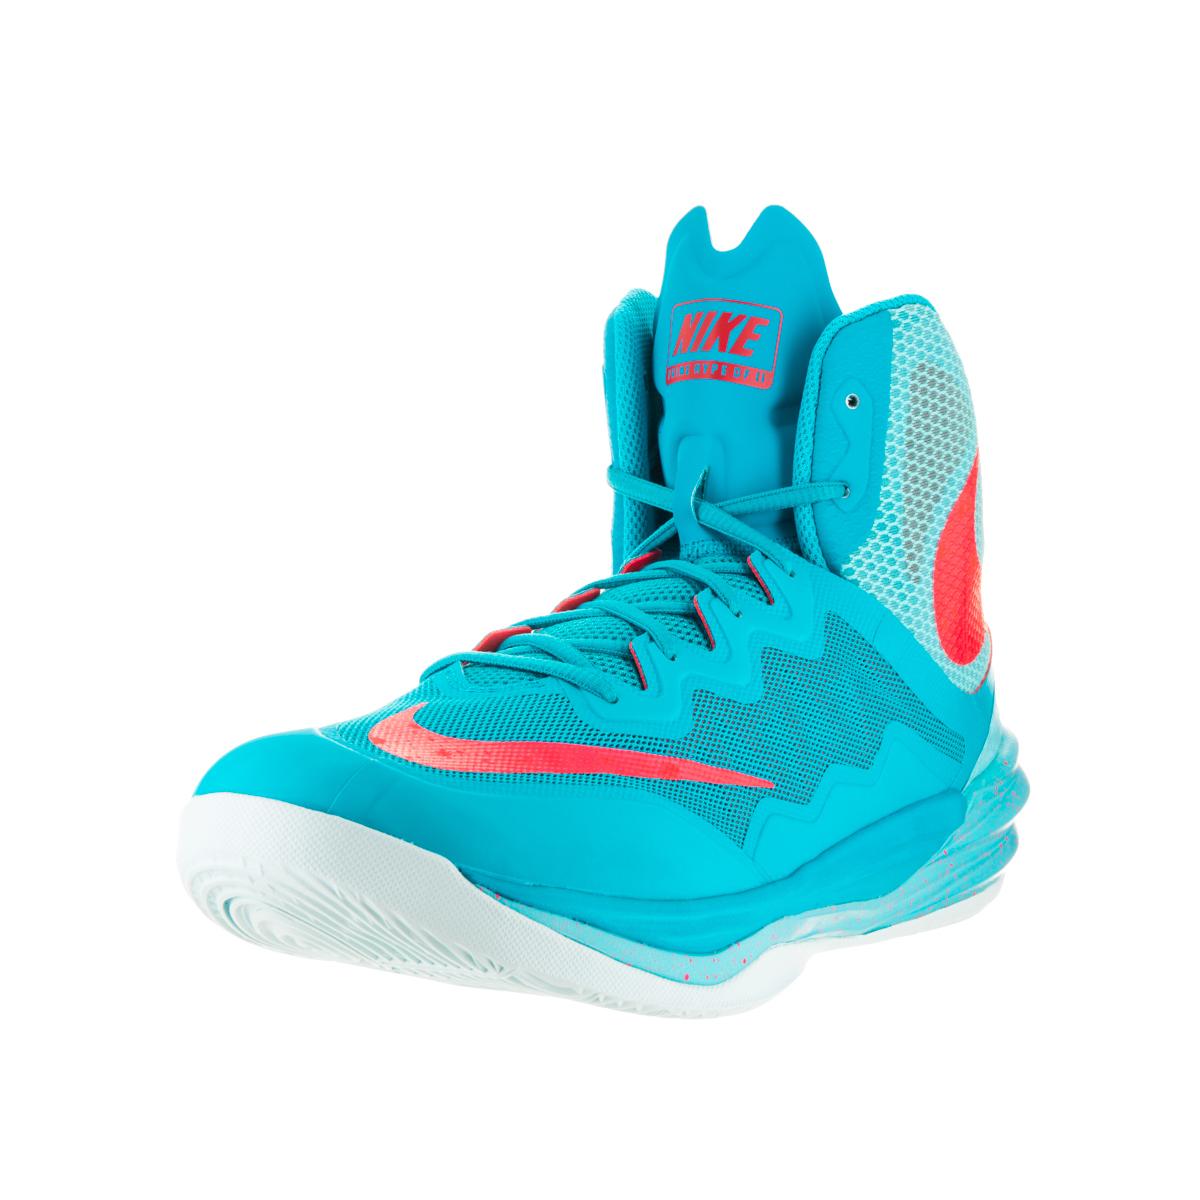 Nike Men's Prime Hype DF II Bl Lgn/Brght Crmsn Td Pl Bl I...